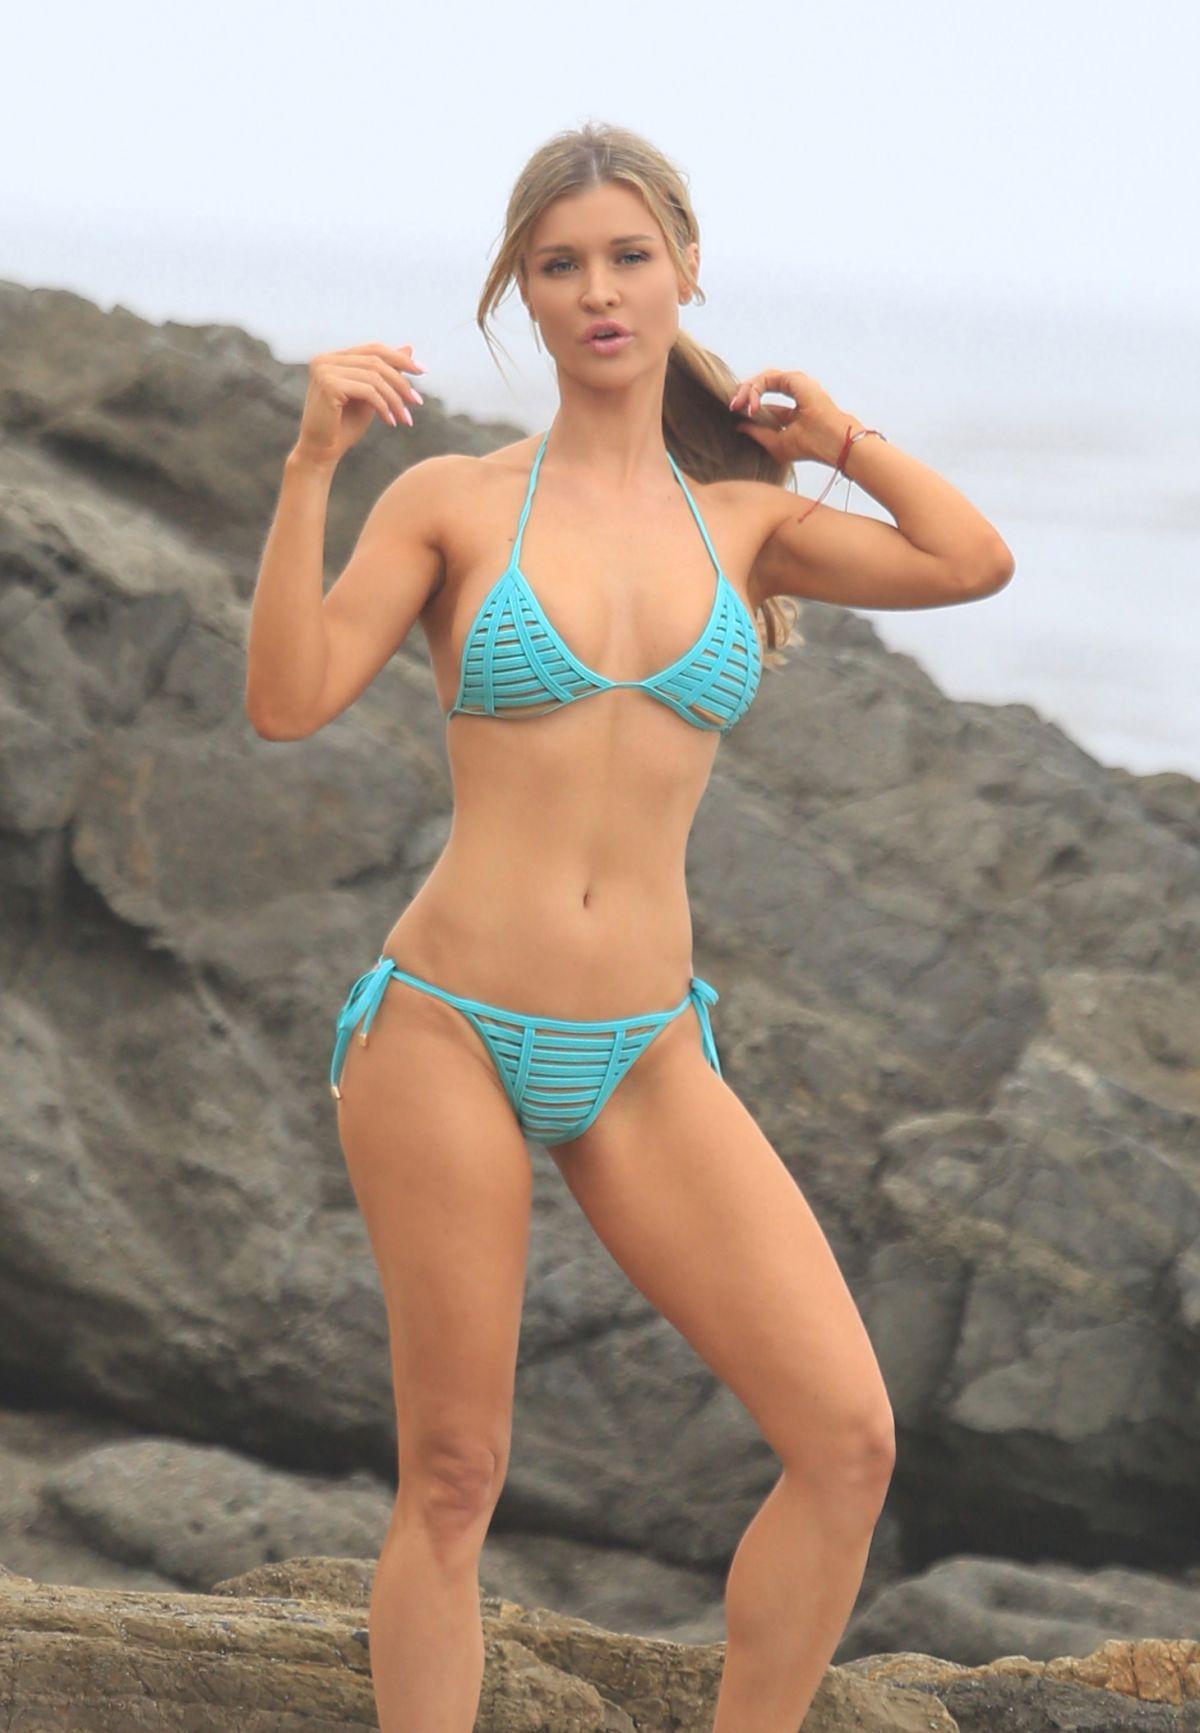 Bikini Caitriona Balfe naked (49 photos), Tits, Sideboobs, Twitter, swimsuit 2018